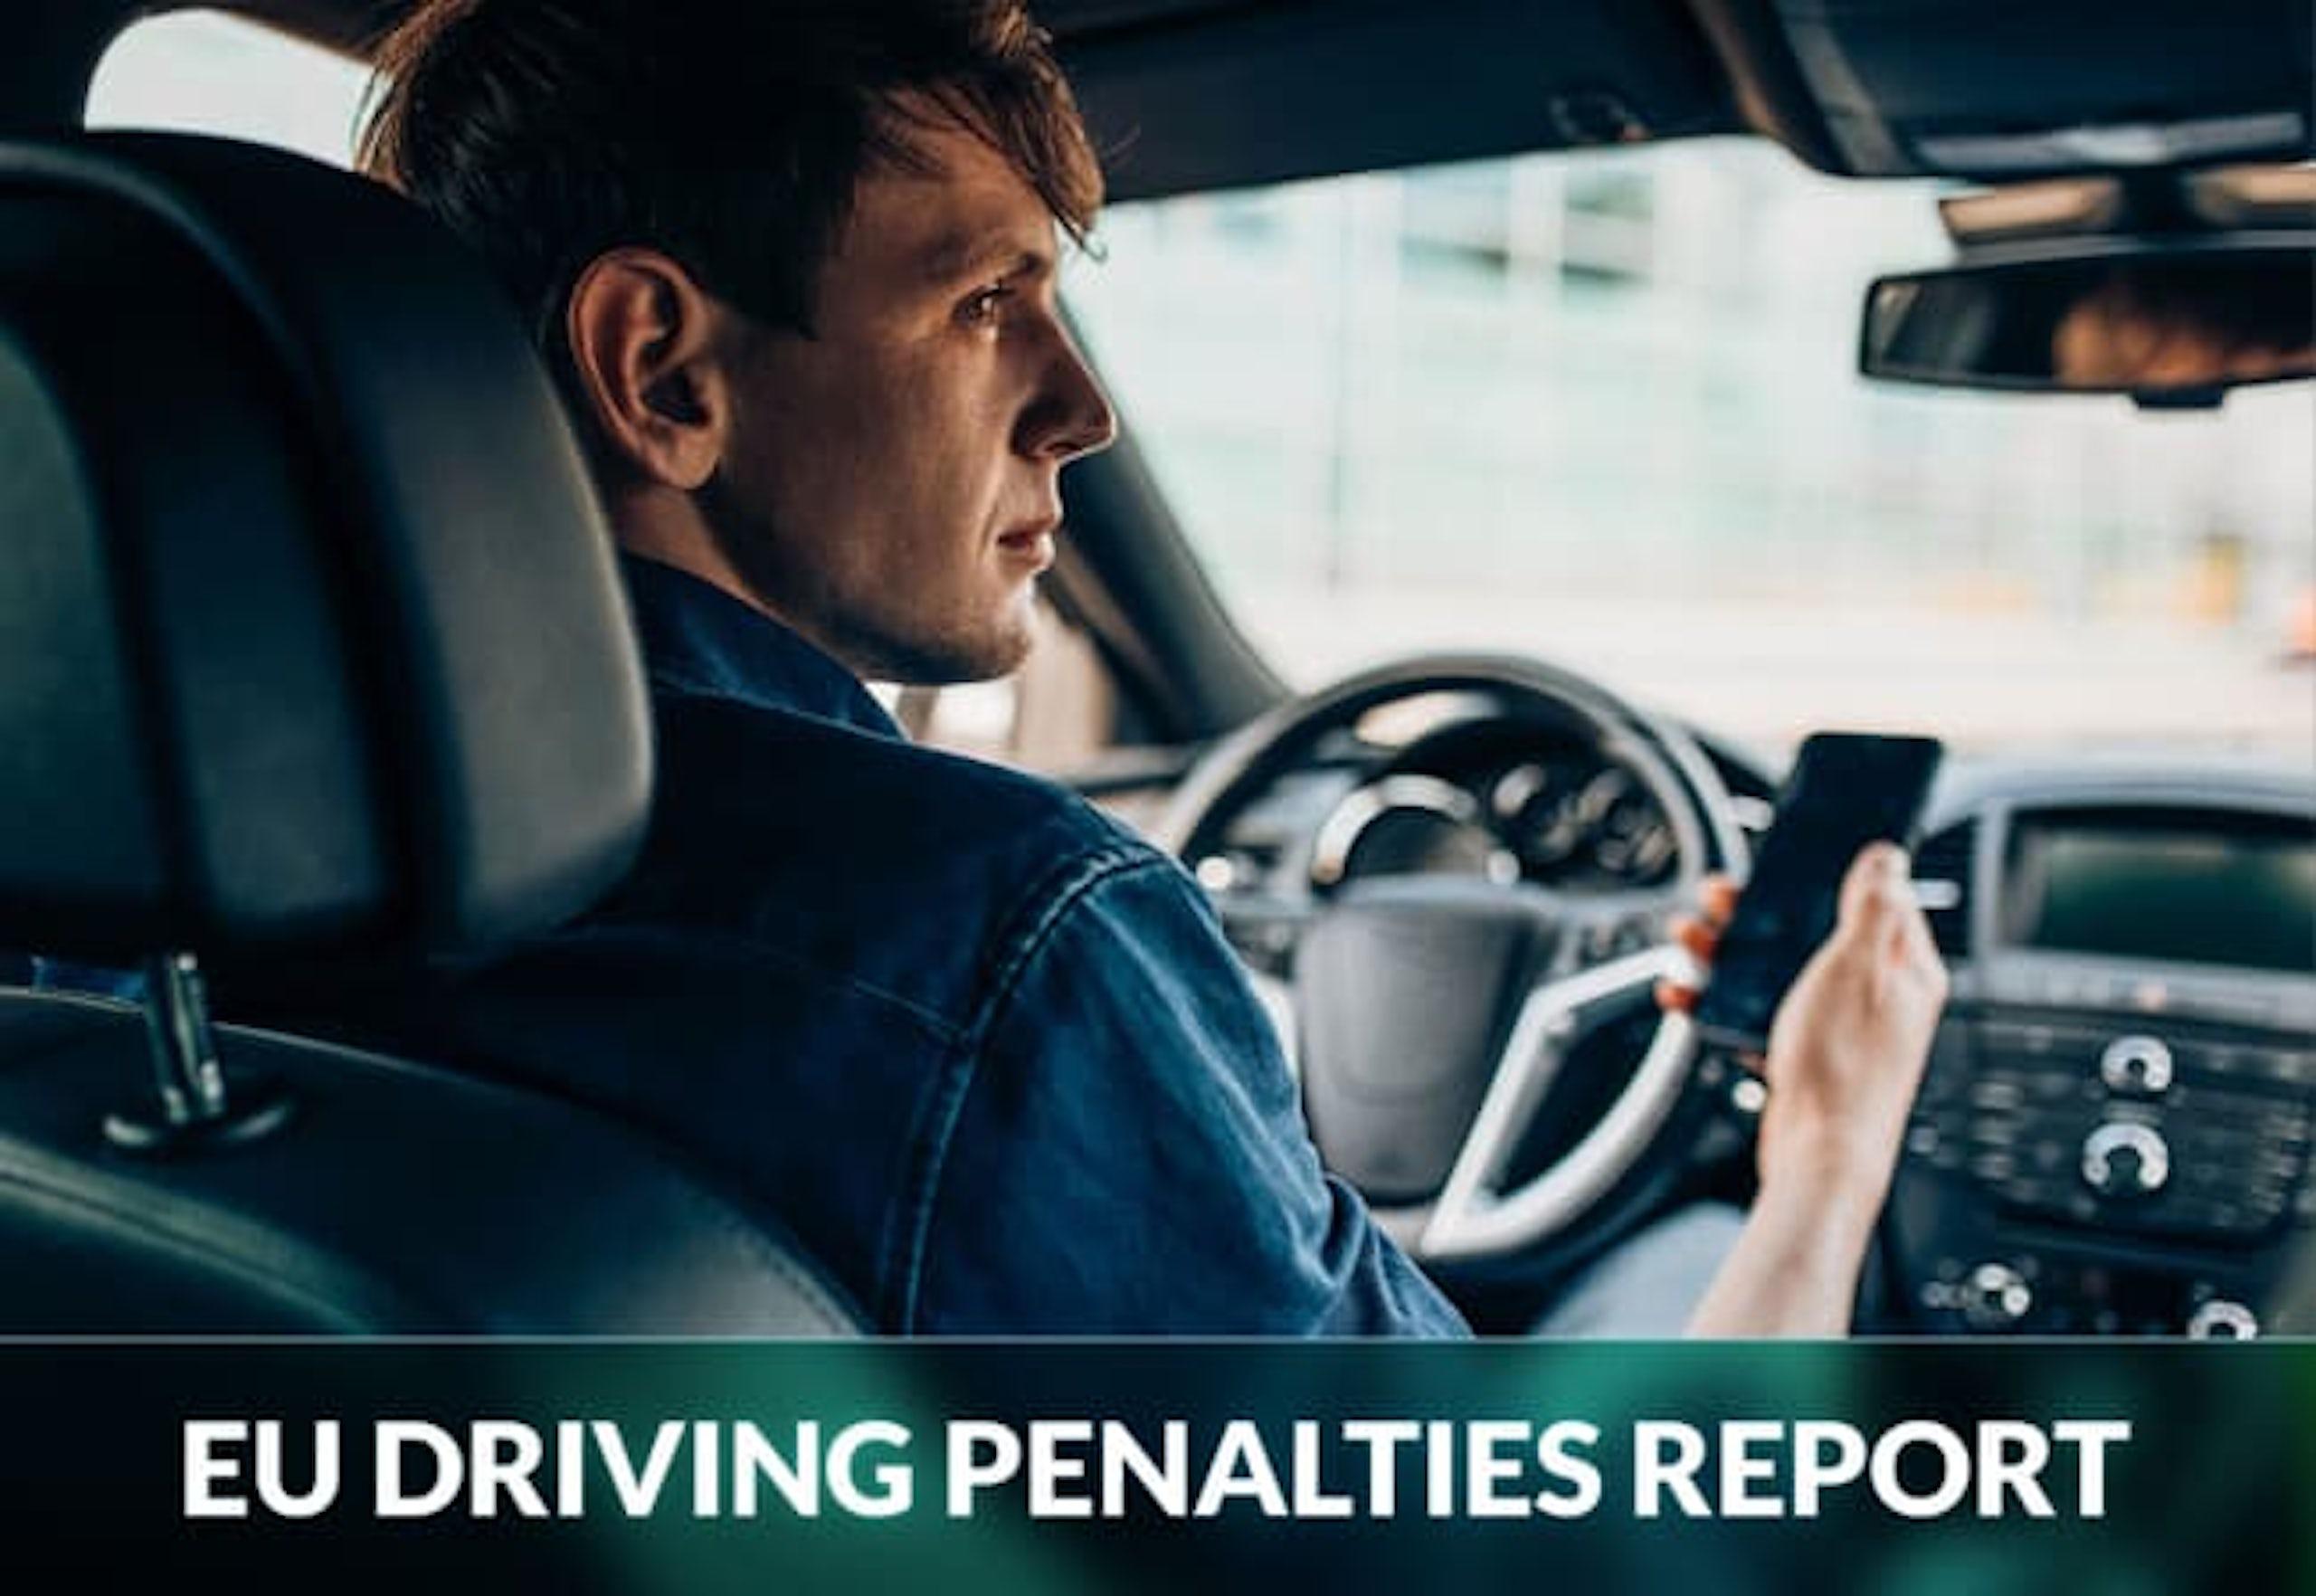 EU DRIVING PENALTIES REPORT